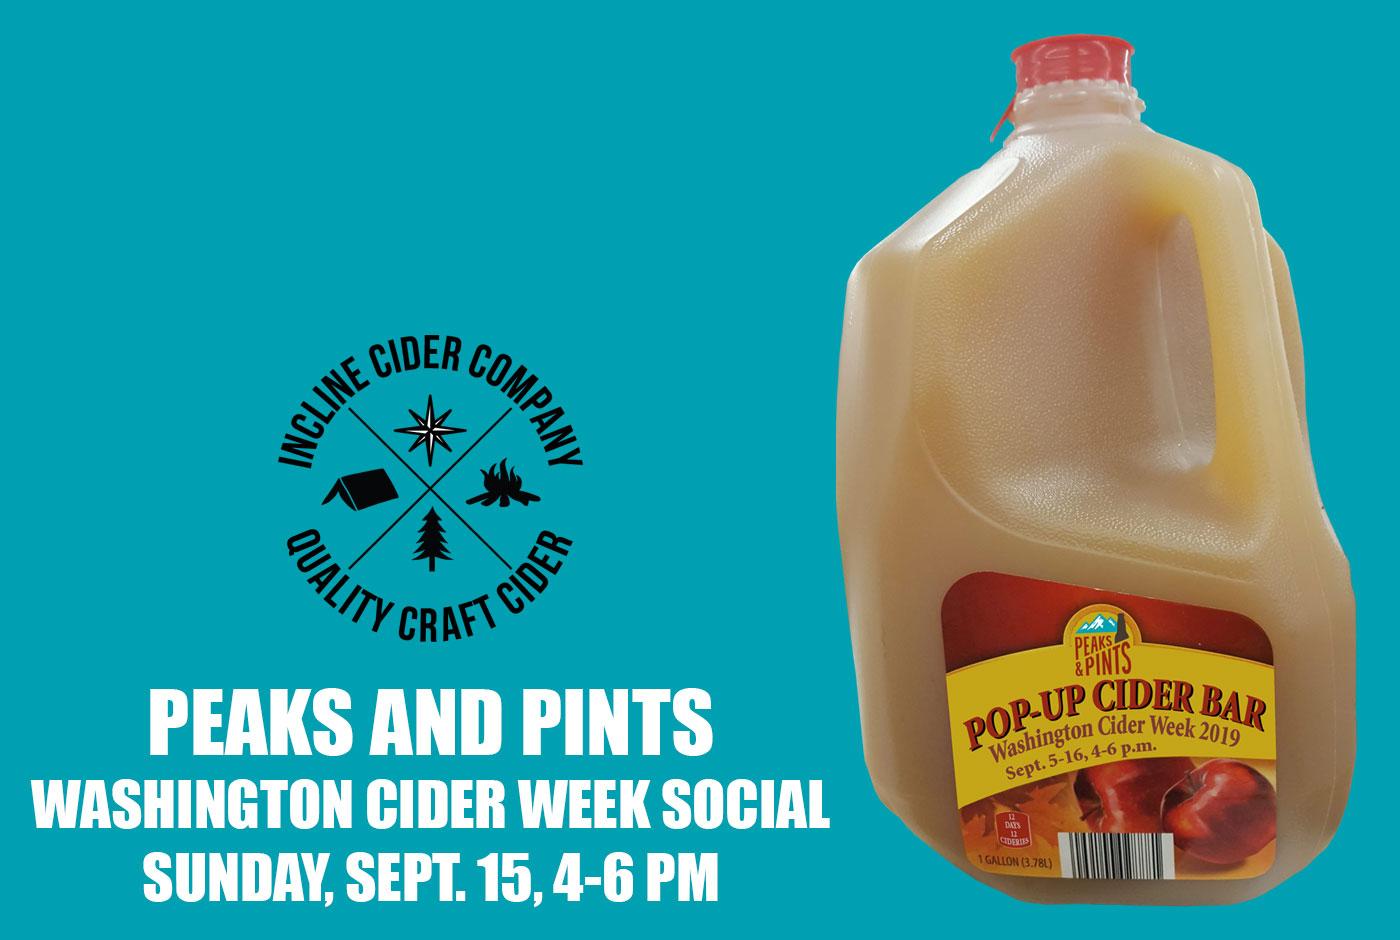 Peaks-and-Pints-Washington-Cider-Week-Socials-Incline-calendar